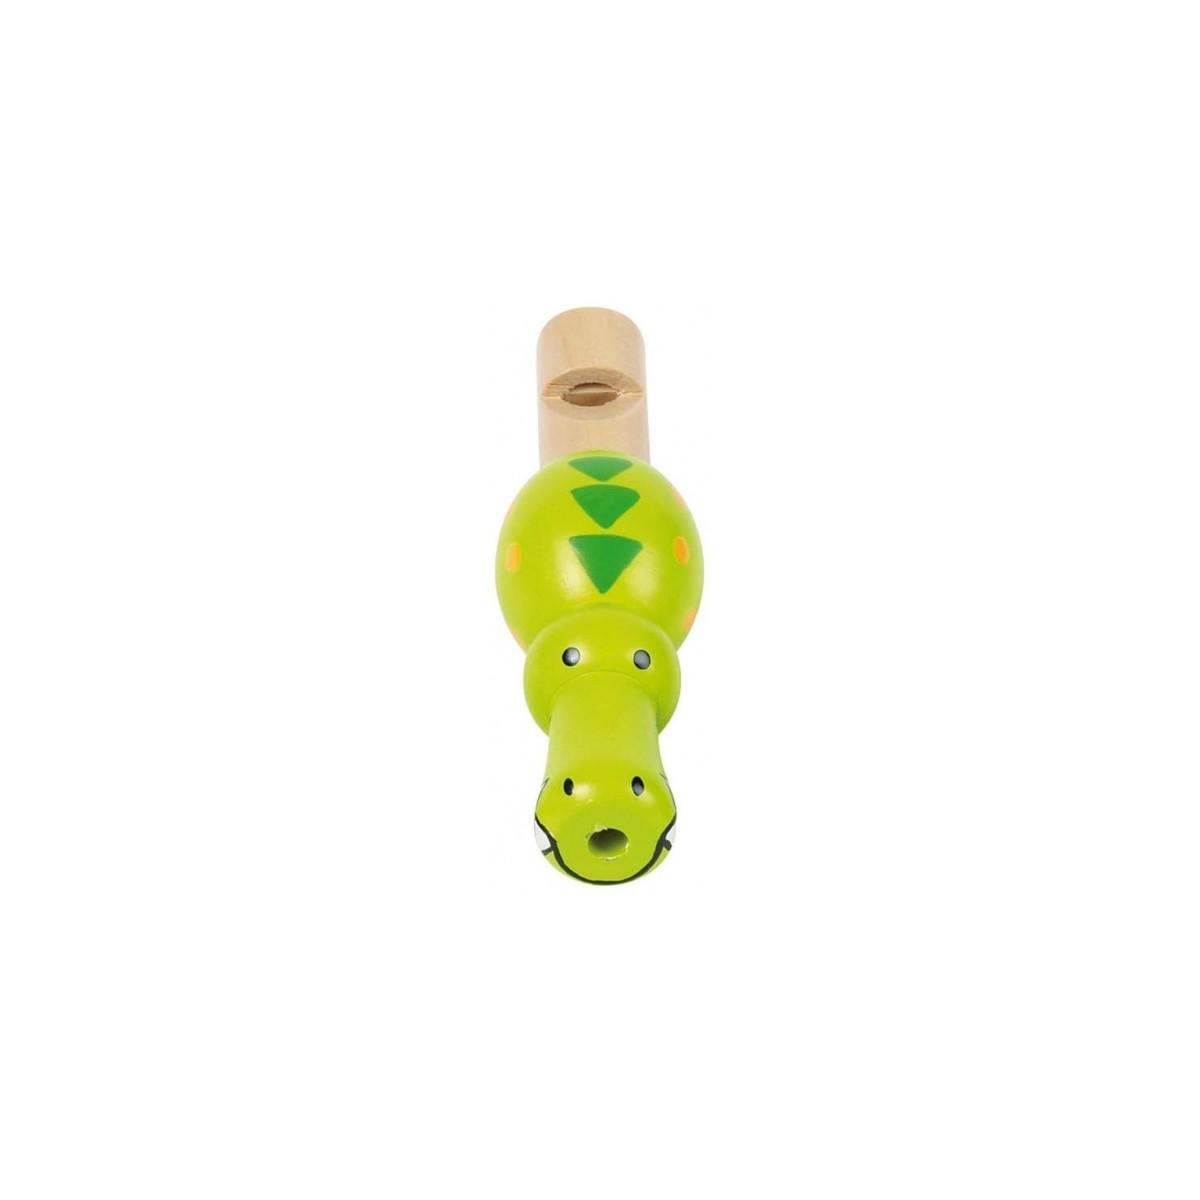 Sifflet croco bois peint vert